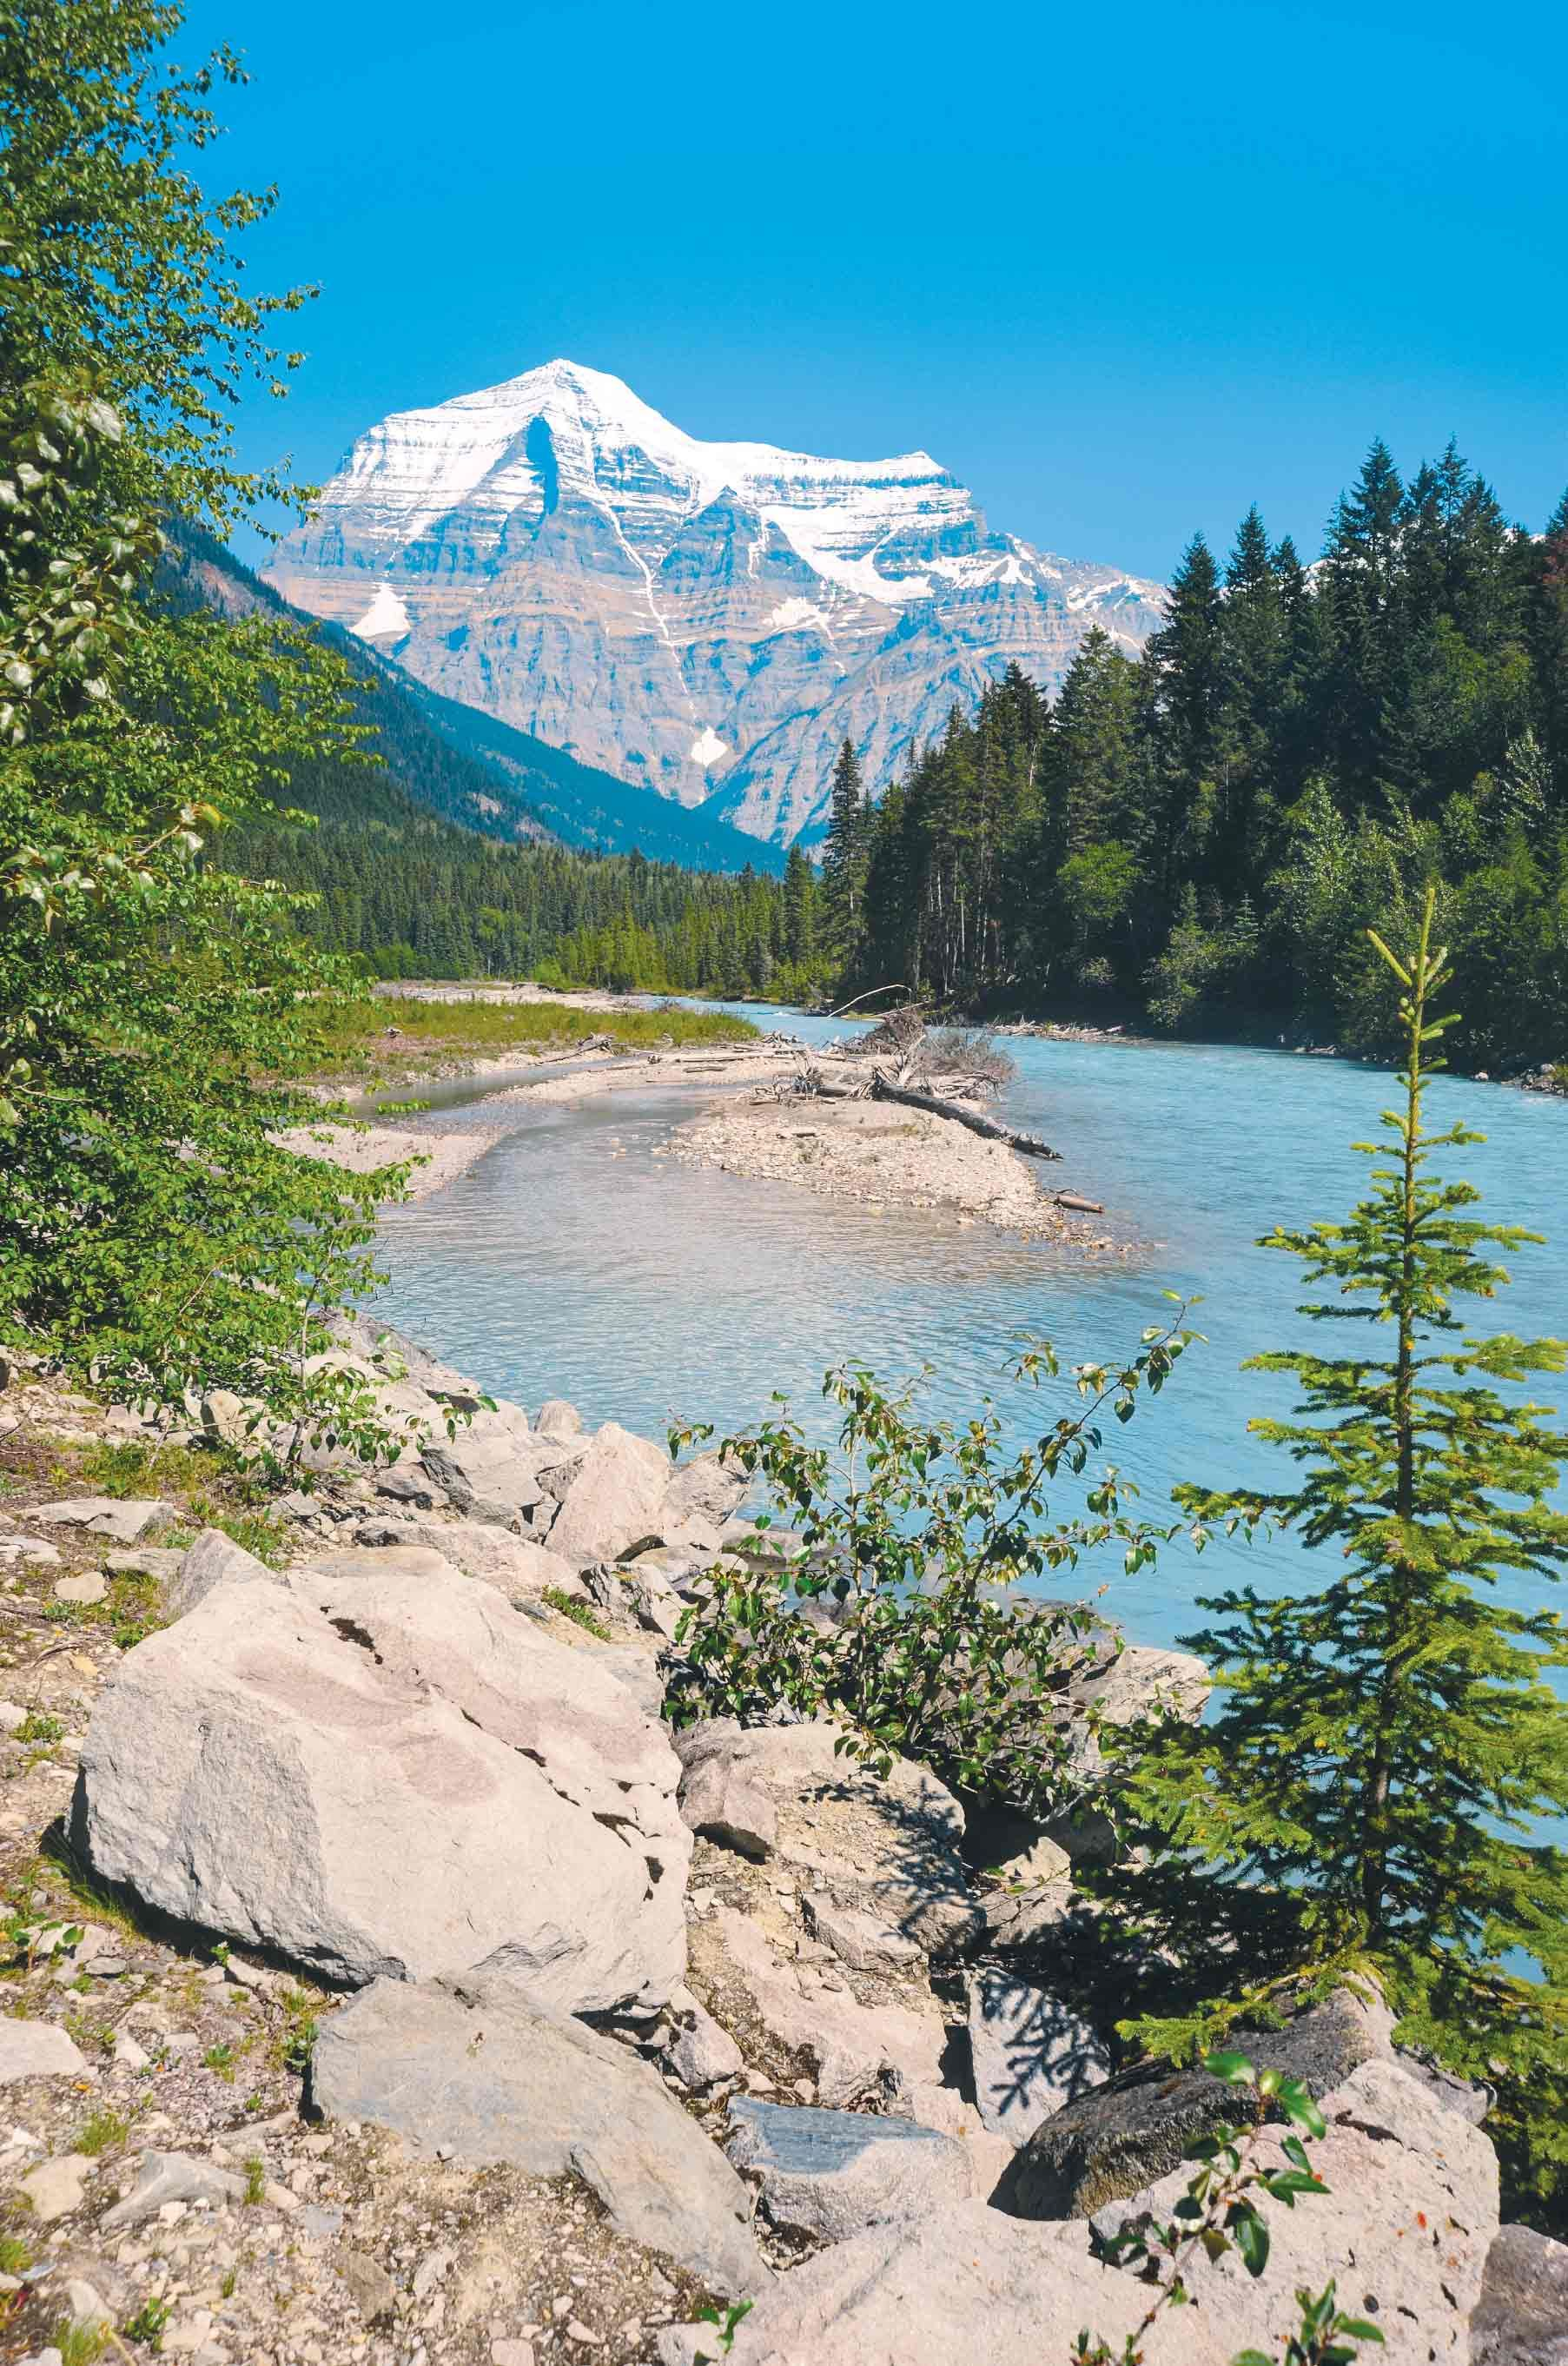 Train Tour Western Canada - Tourism Company and Tourism ...